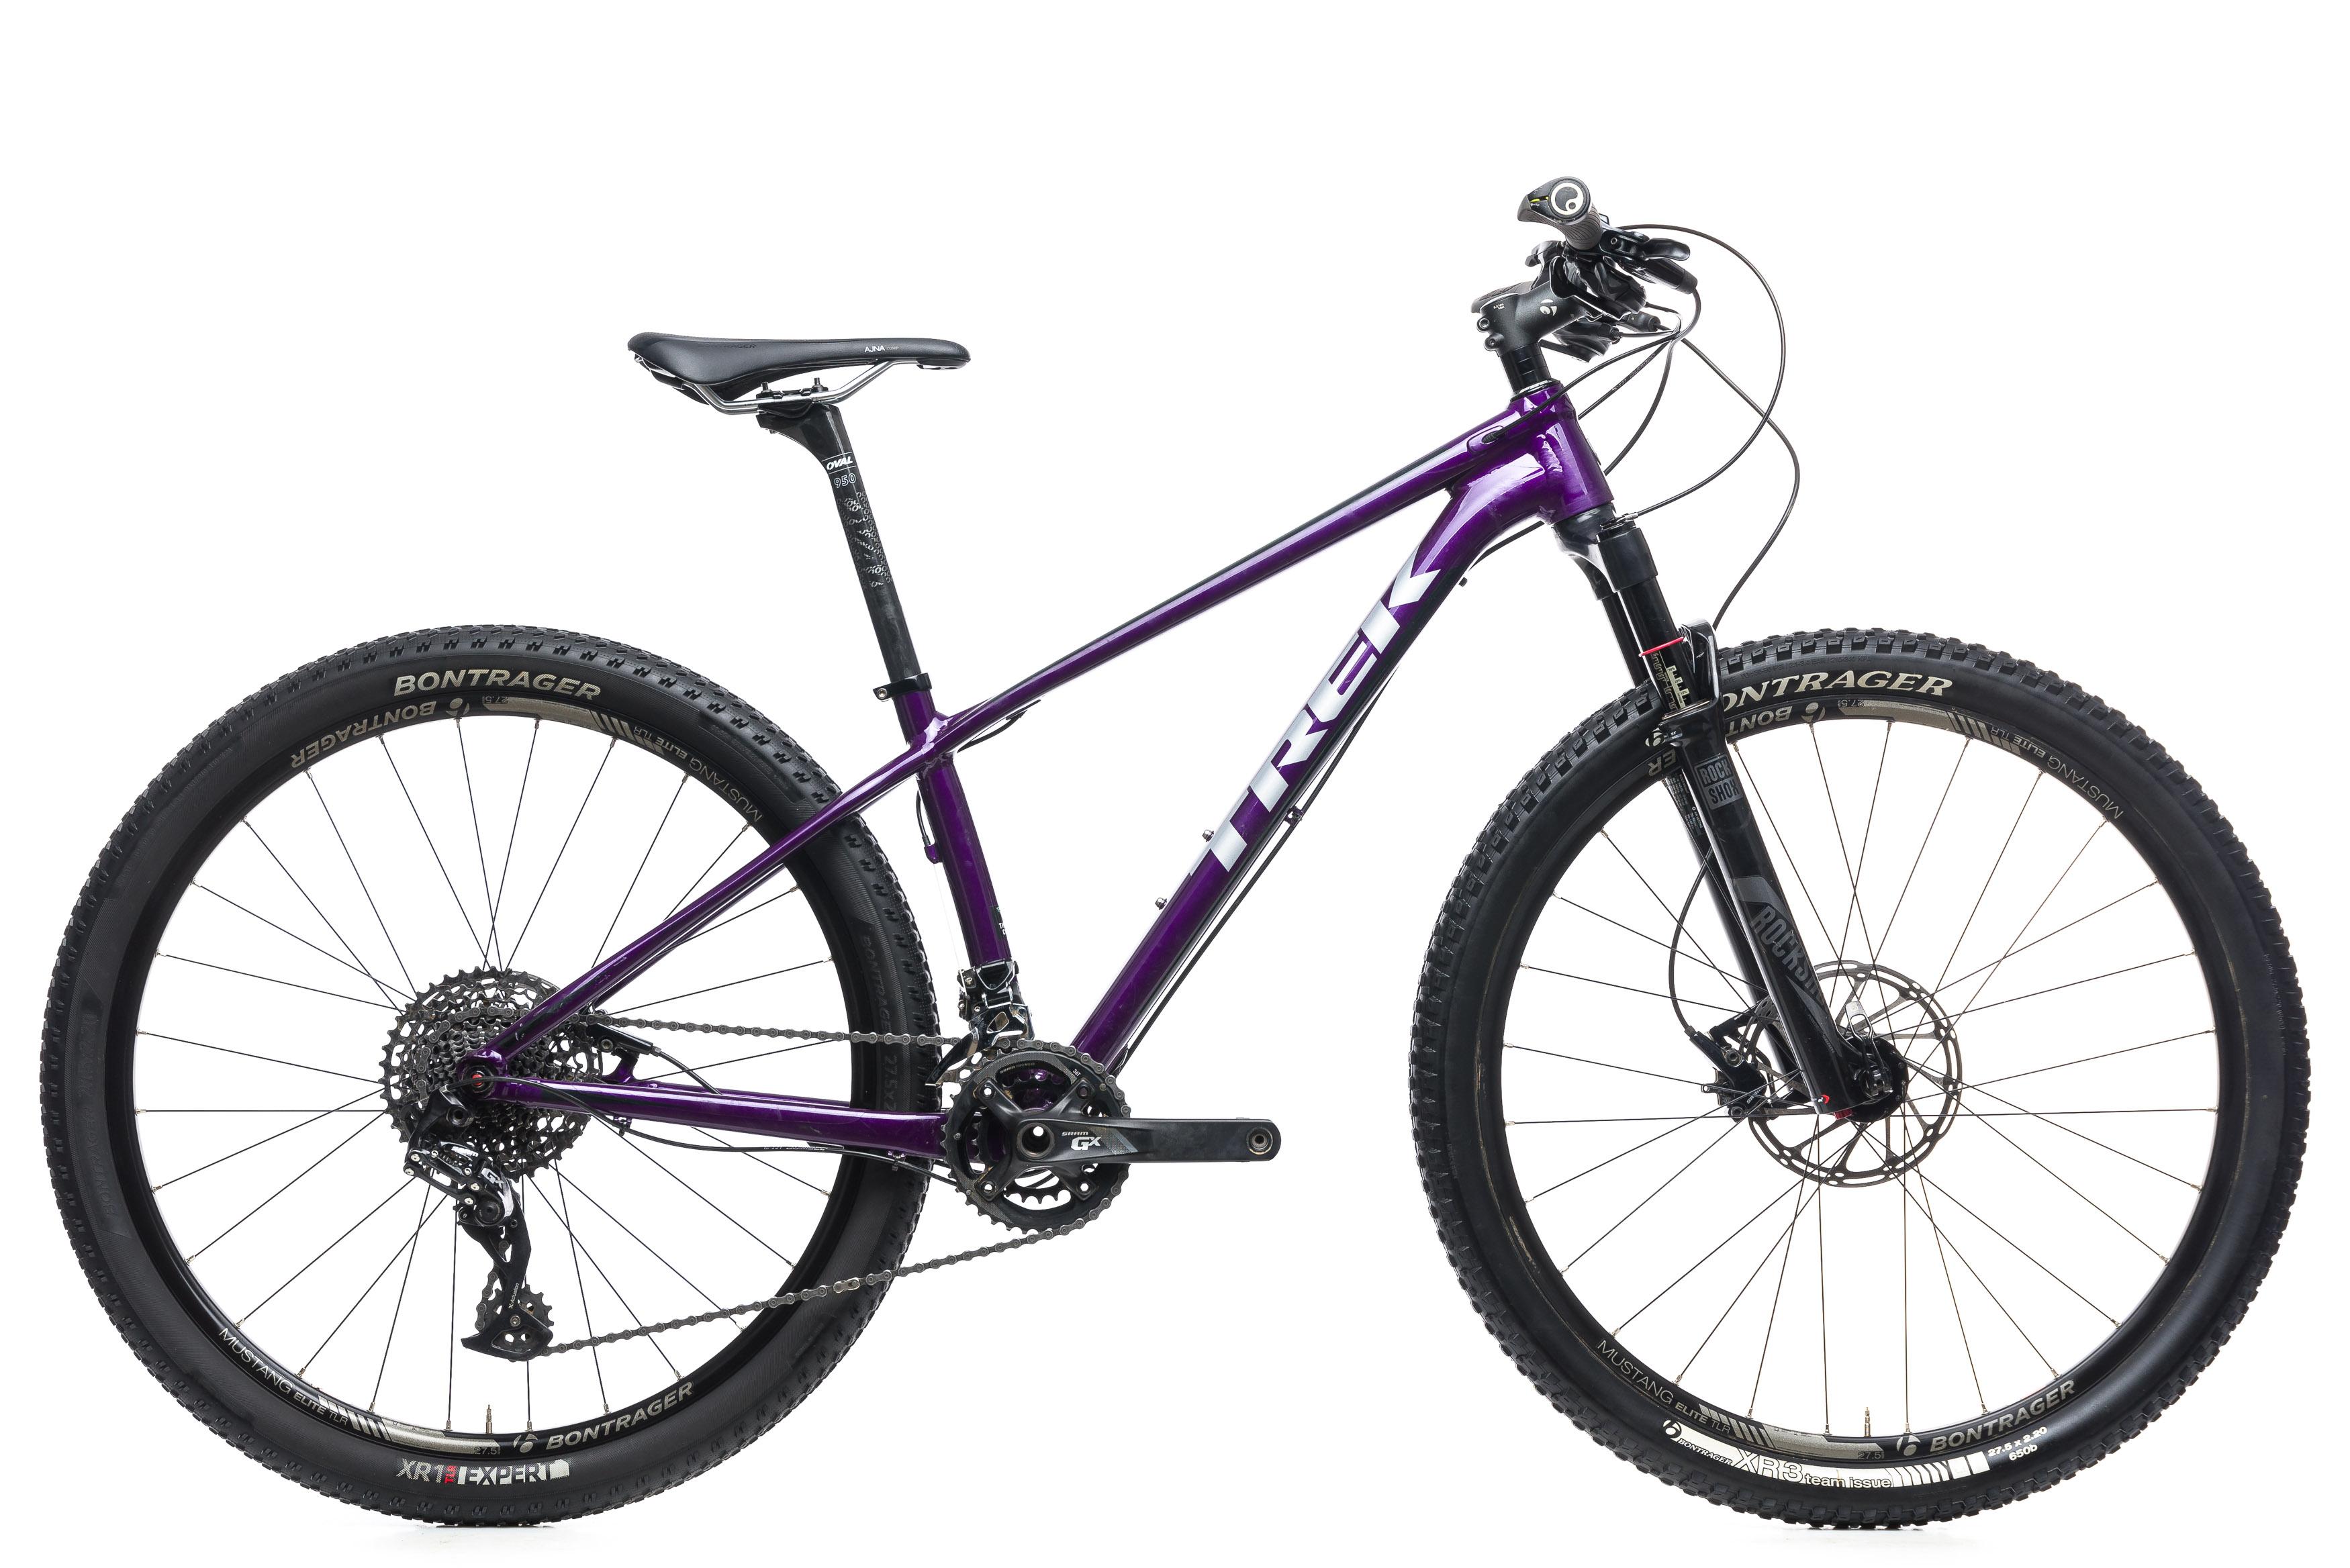 bf67d4a014f 2017 Trek Superfly 6 Womens Mountain Bike 15.5